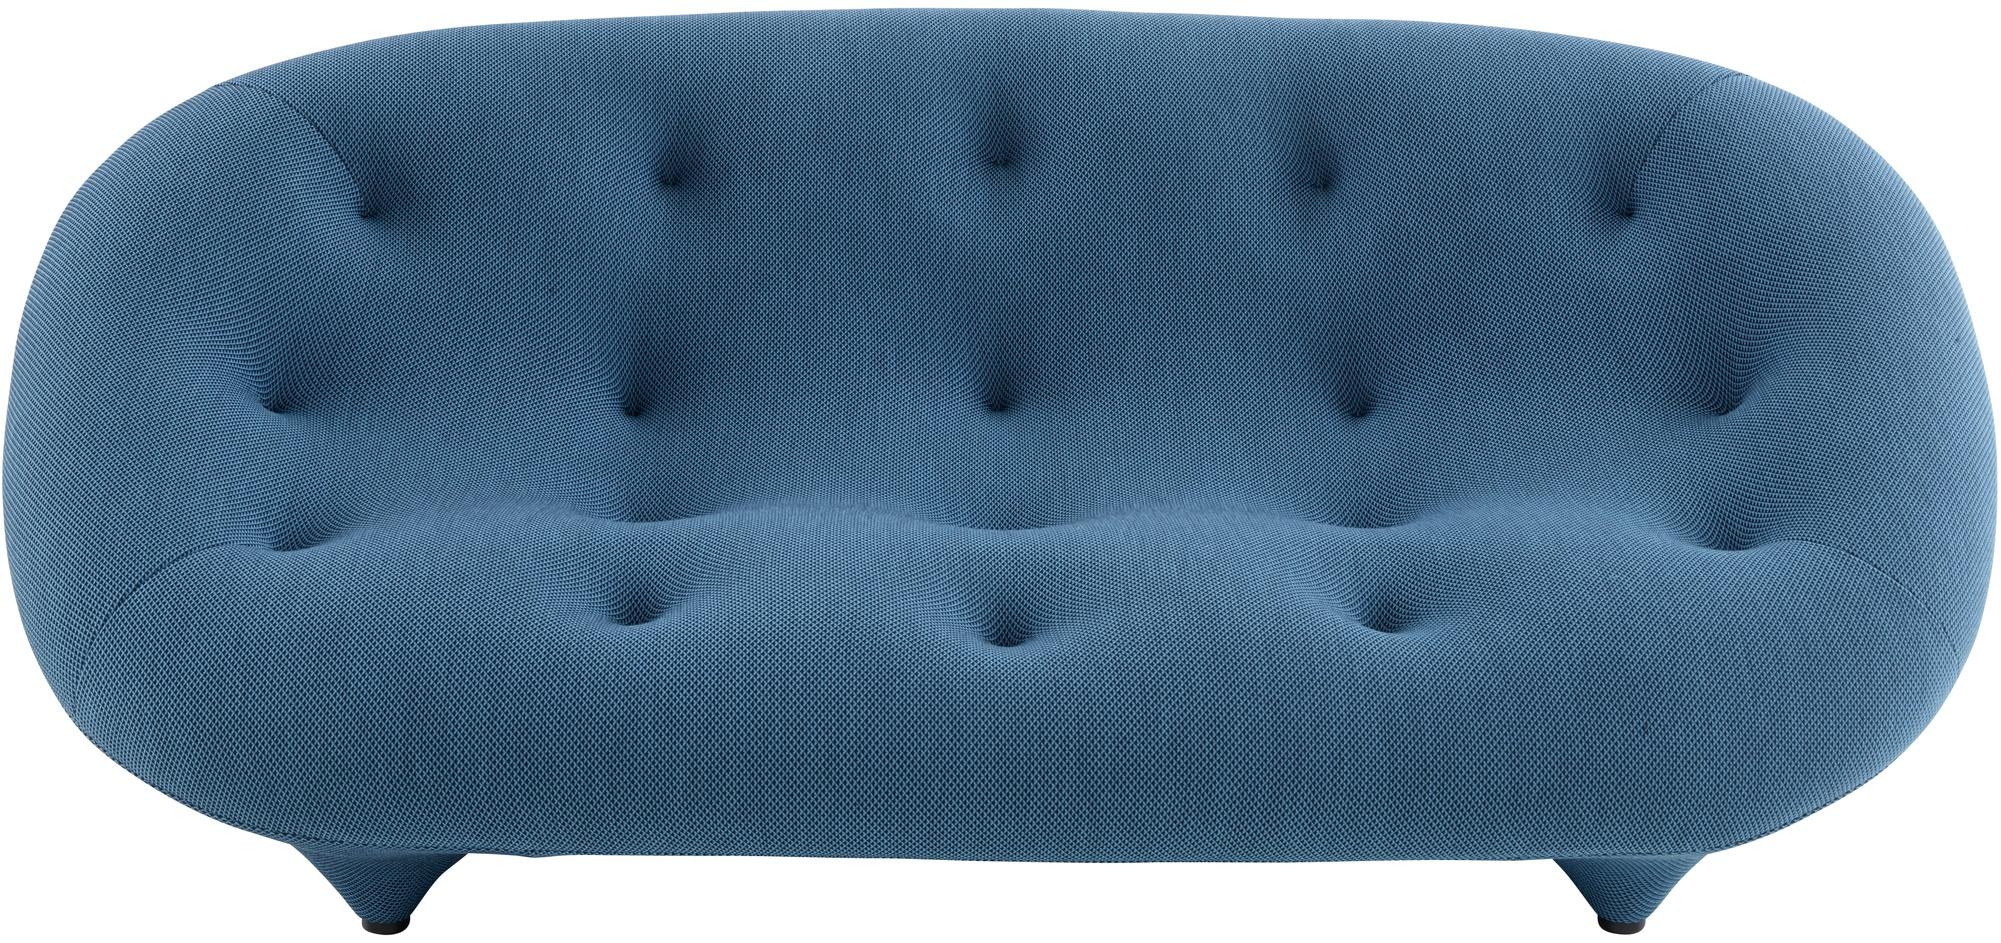 Ploum zetel sofa Ligne Roset design meubelwinkel Loncin Leuven Hasselt mechelen Sint-truiden Brussels Bruxelles Anwterpen Gent 5.jpg